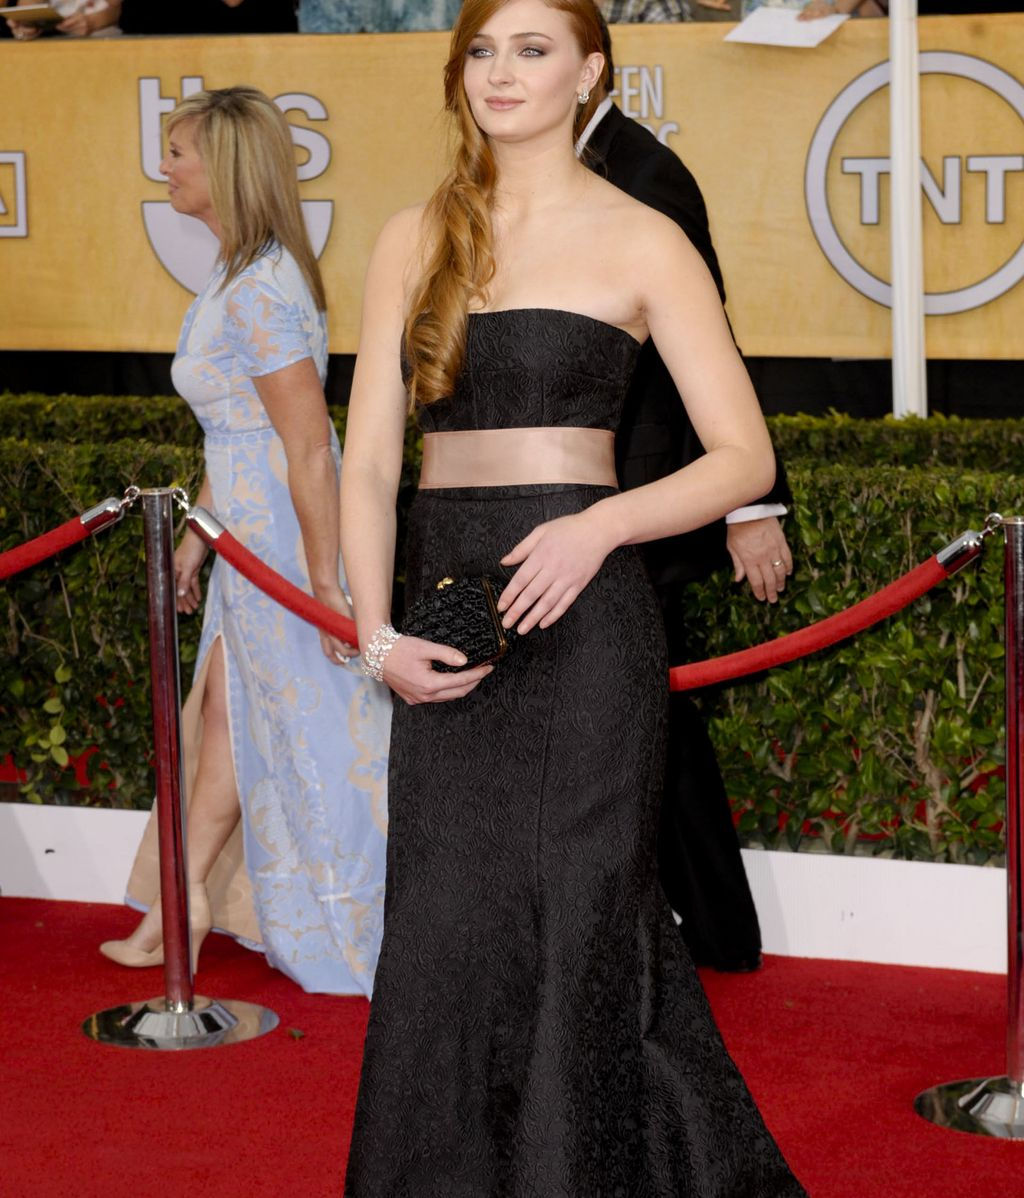 La jovencísima Sophie Turner, muy elegante de negro